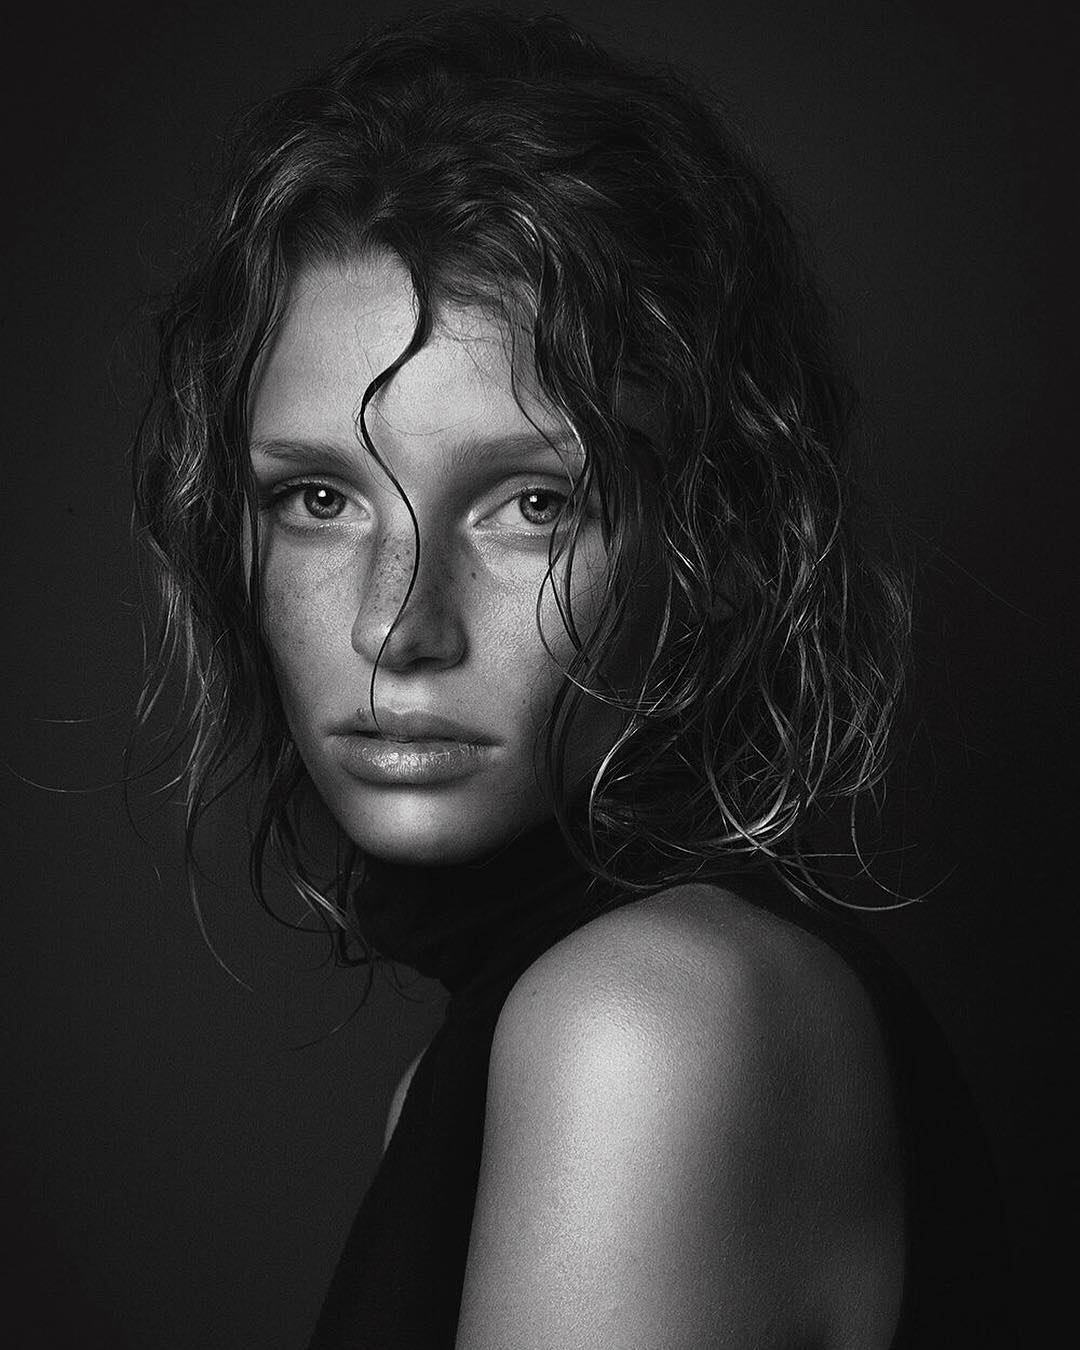 beautiful_black_and_white_portrait_photography_26.jpg